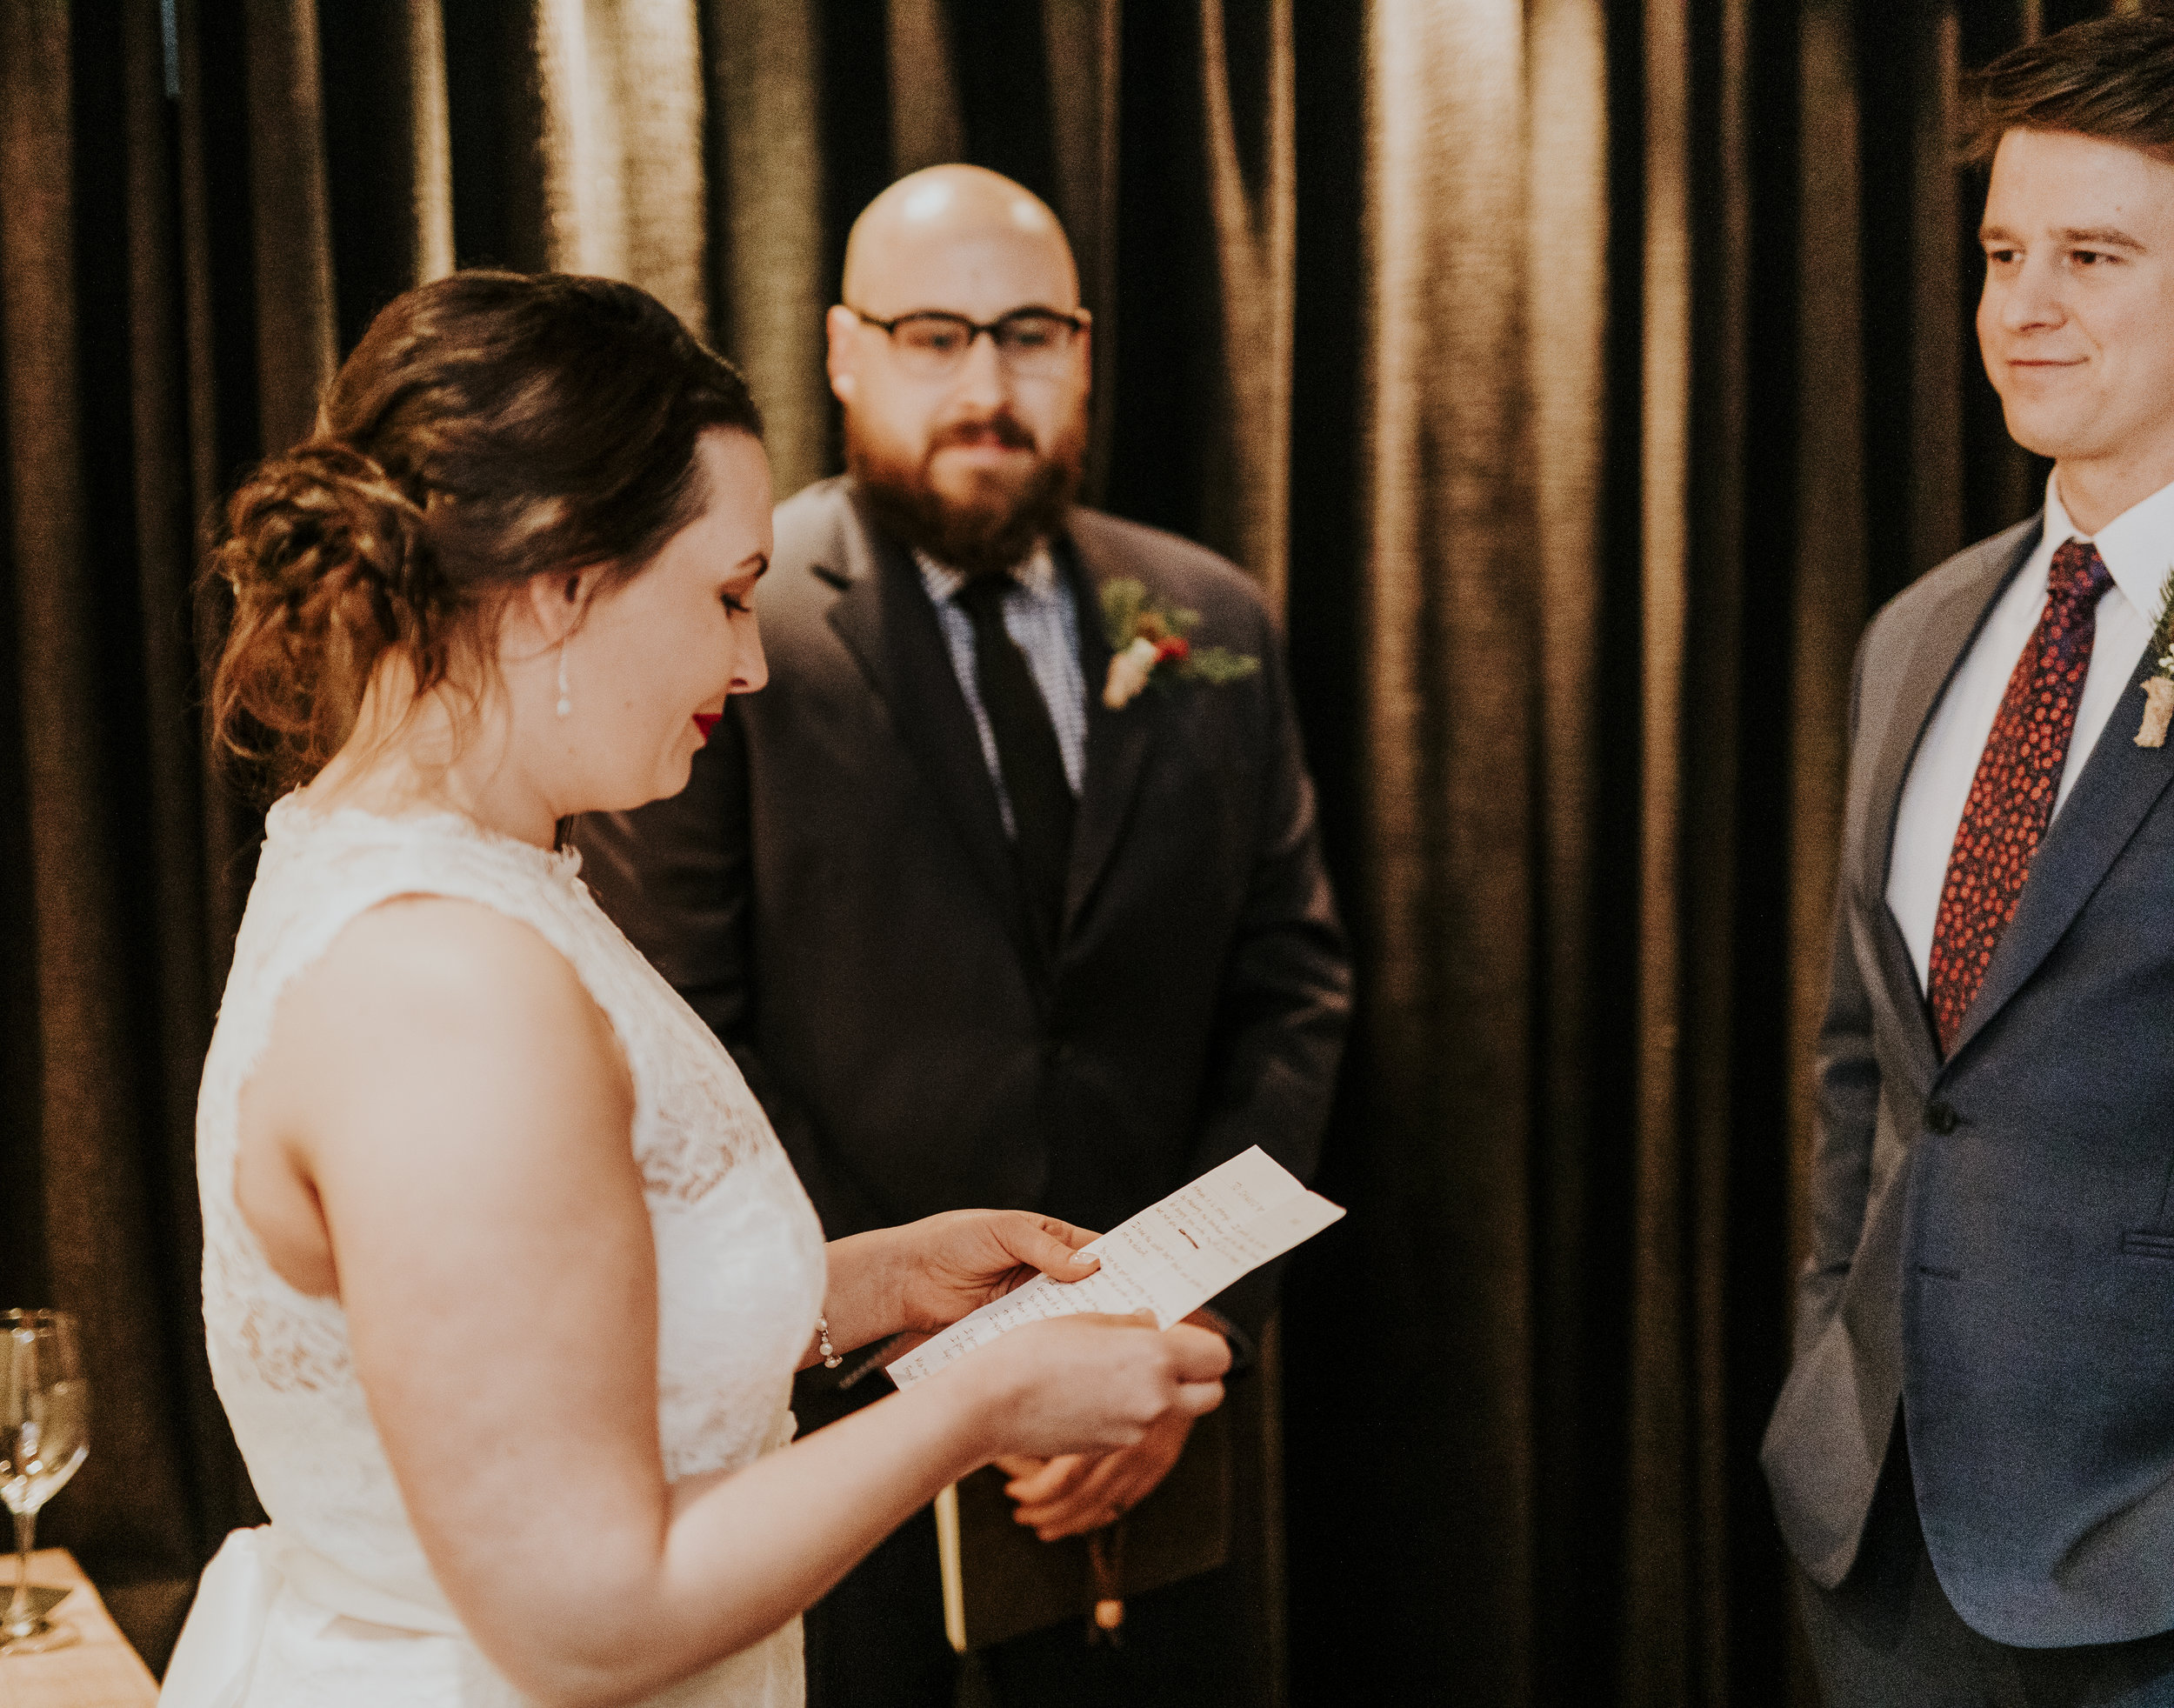 003_Ceremony-007.jpg